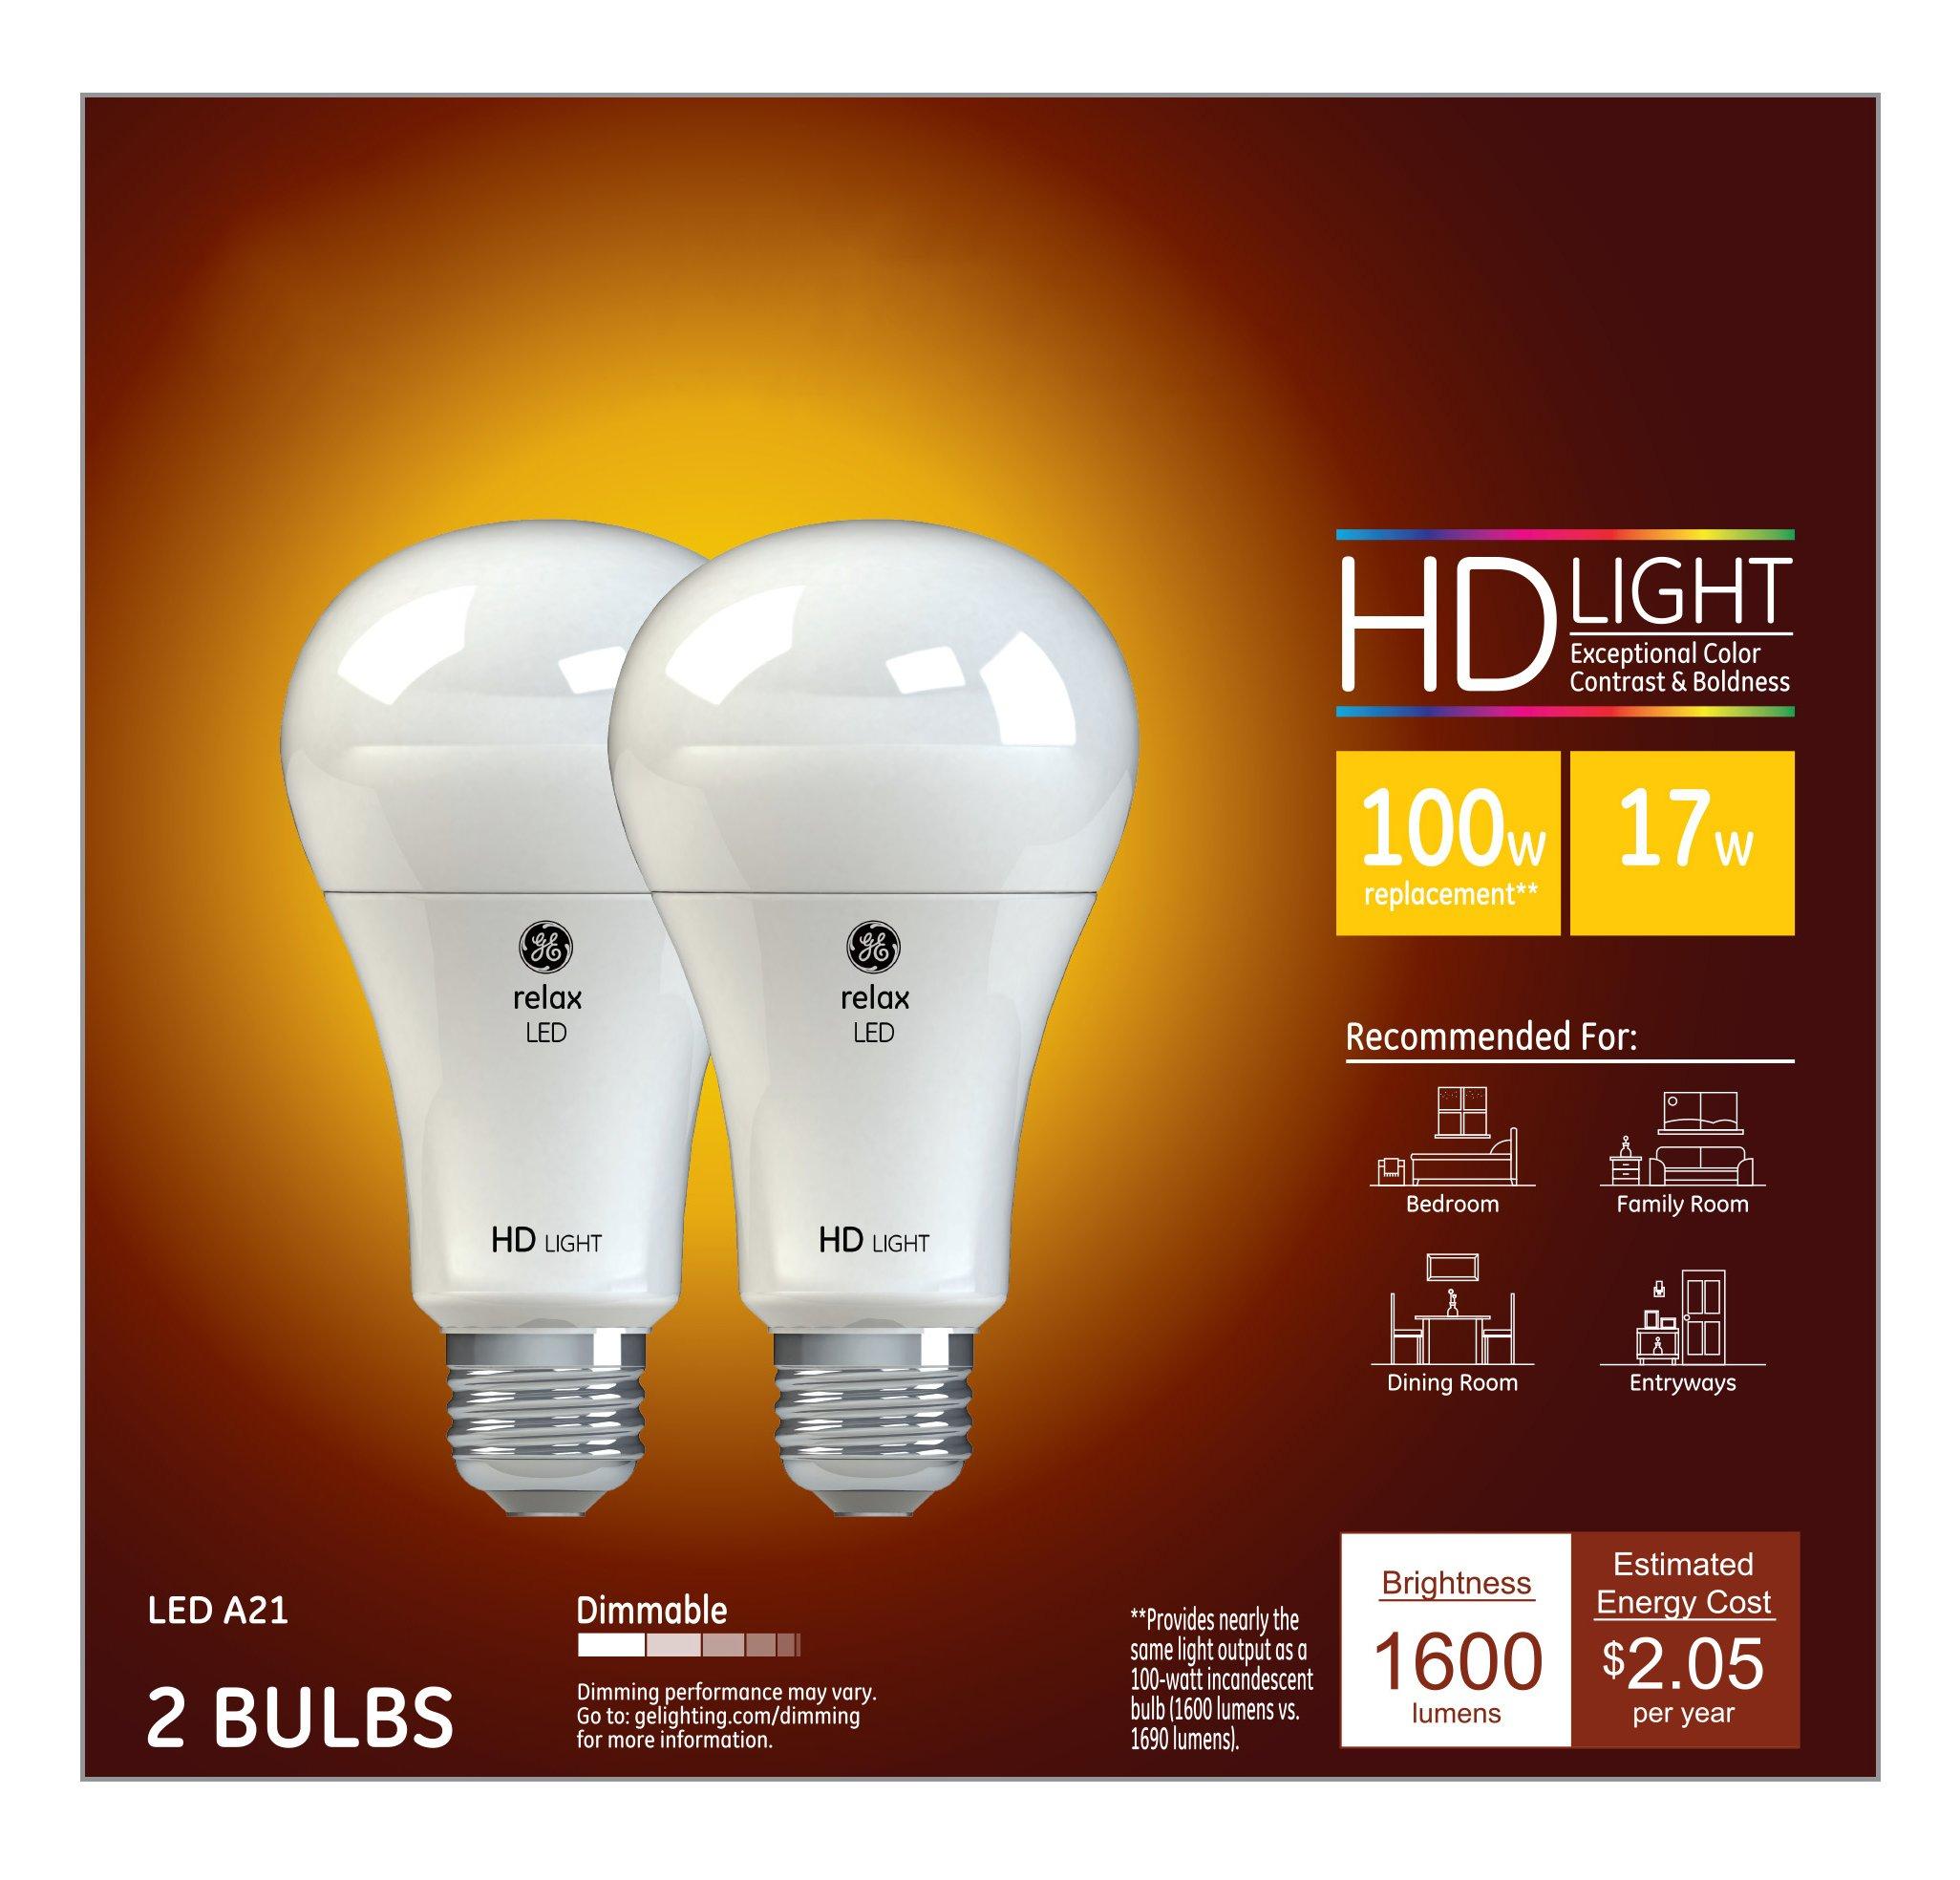 ge lighting relax led hd 17 watt 100 watt replacement 1600 lumen a21 light ebay. Black Bedroom Furniture Sets. Home Design Ideas